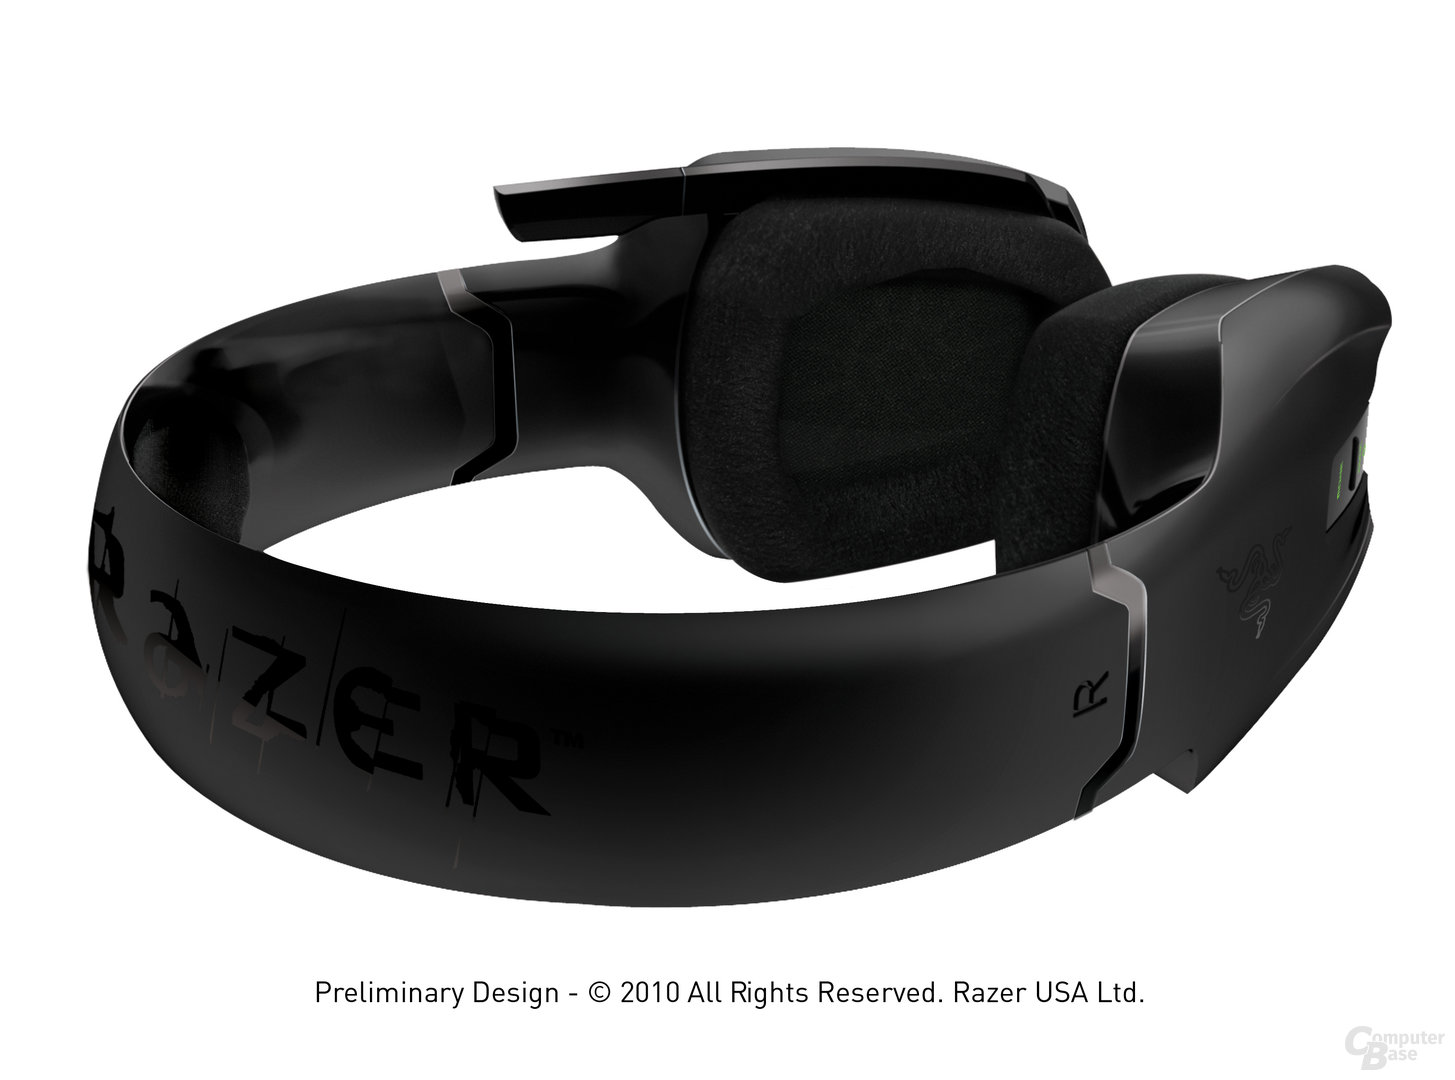 Razers Xbox-360-Headset Chimaera